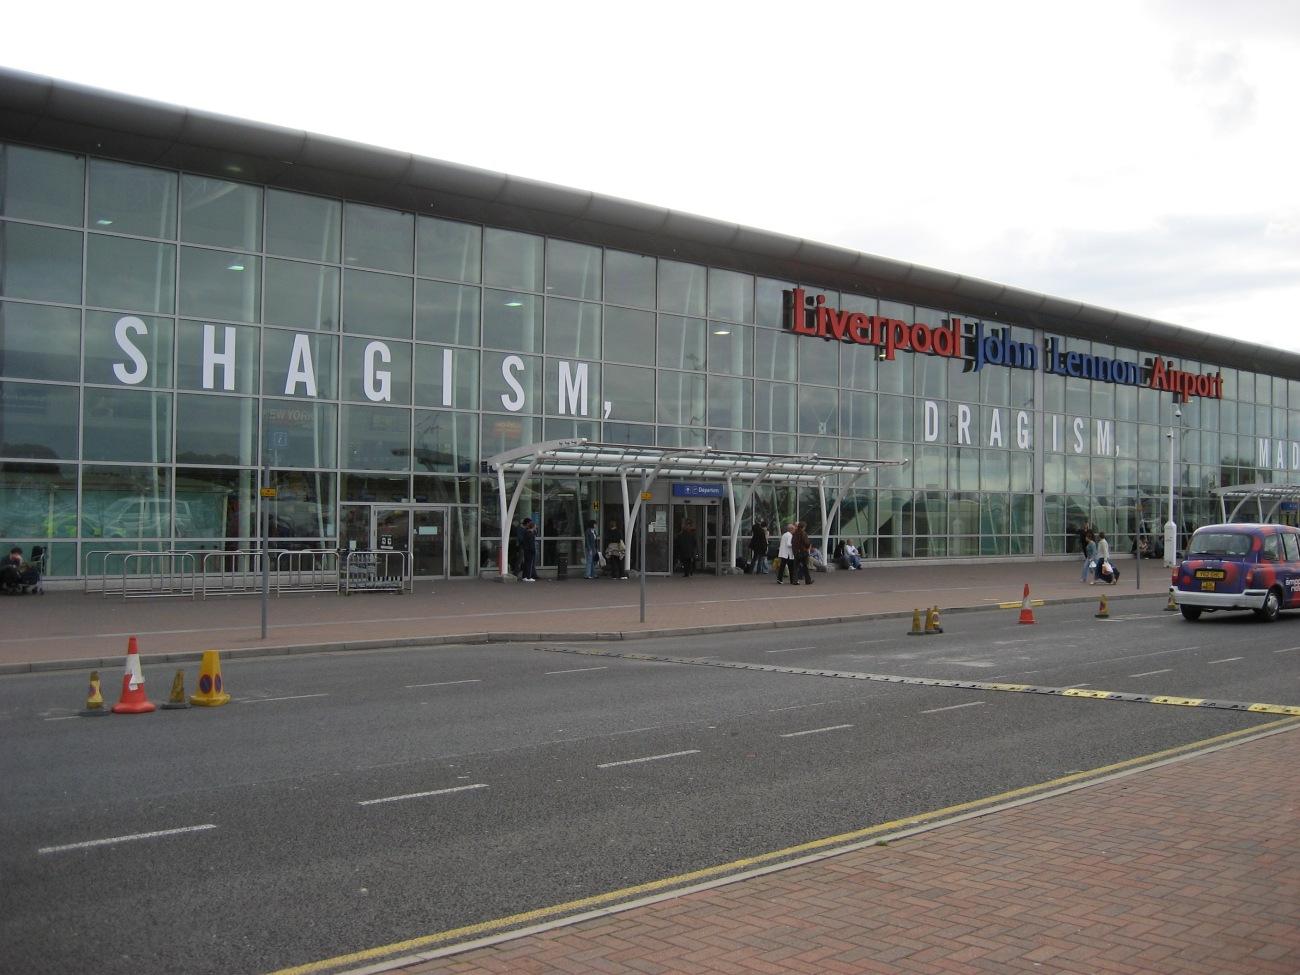 Liverpool_John_Lennon_Airport-2006-09-28